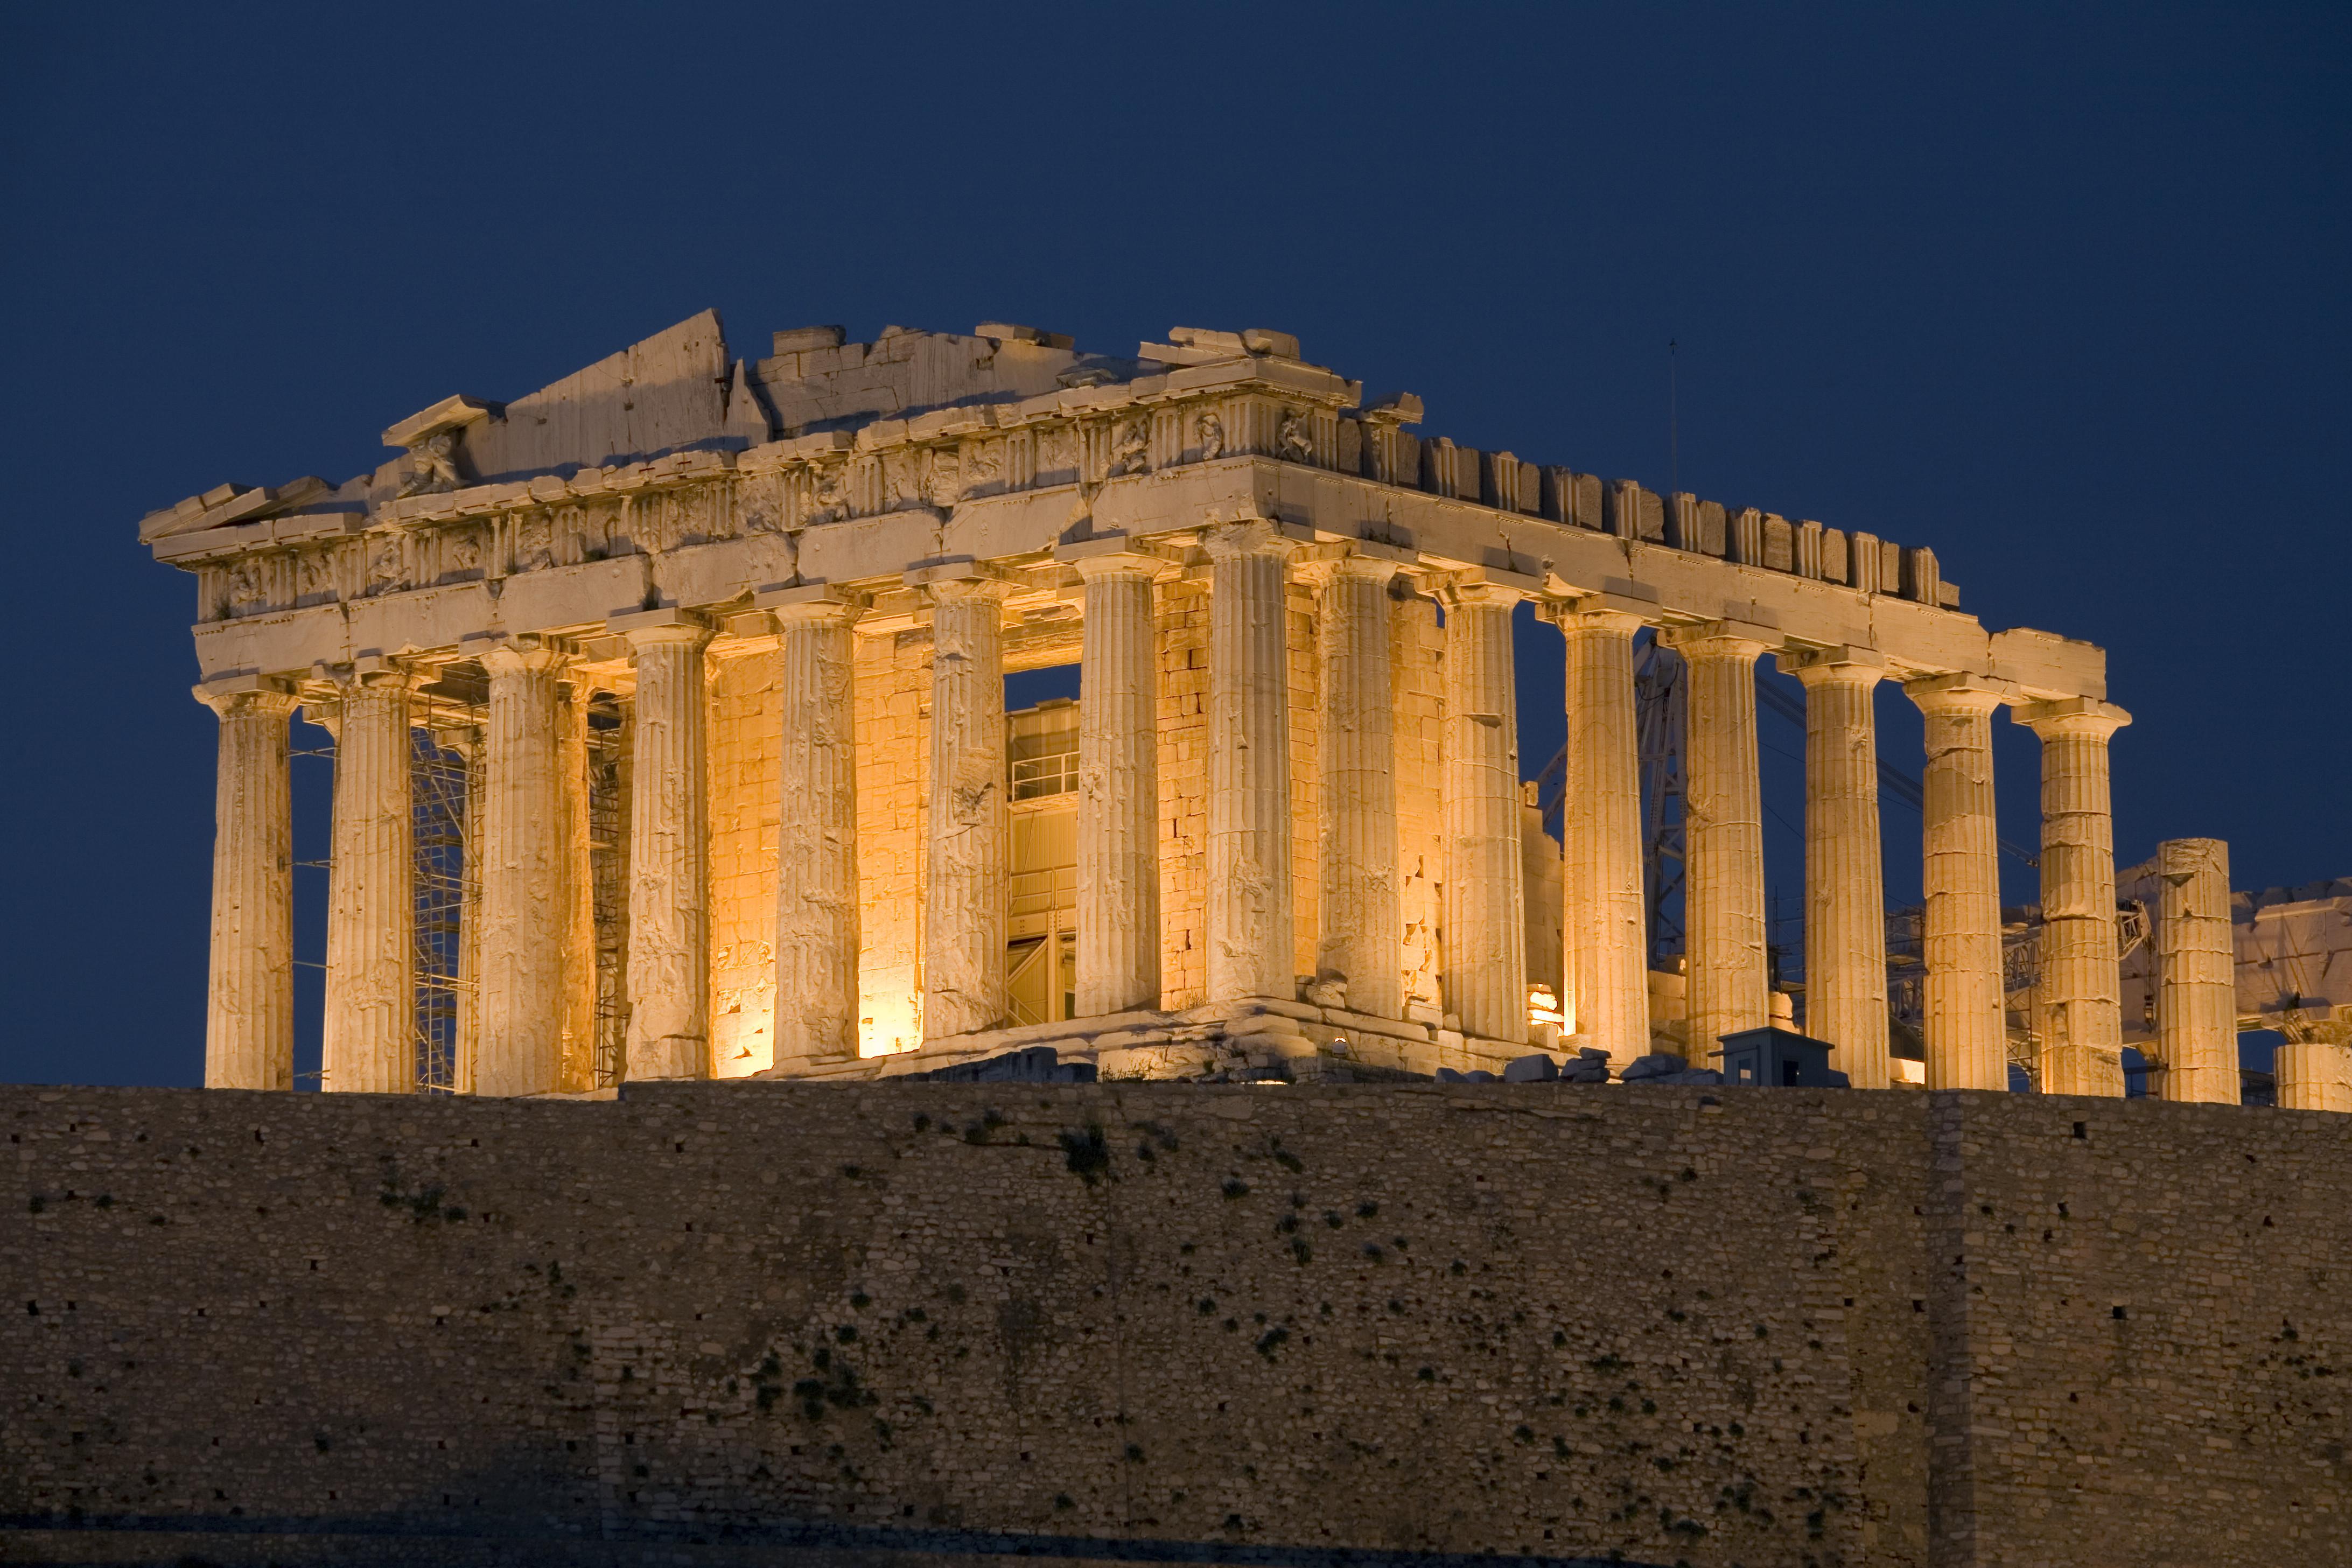 The Parthenon at Dusk